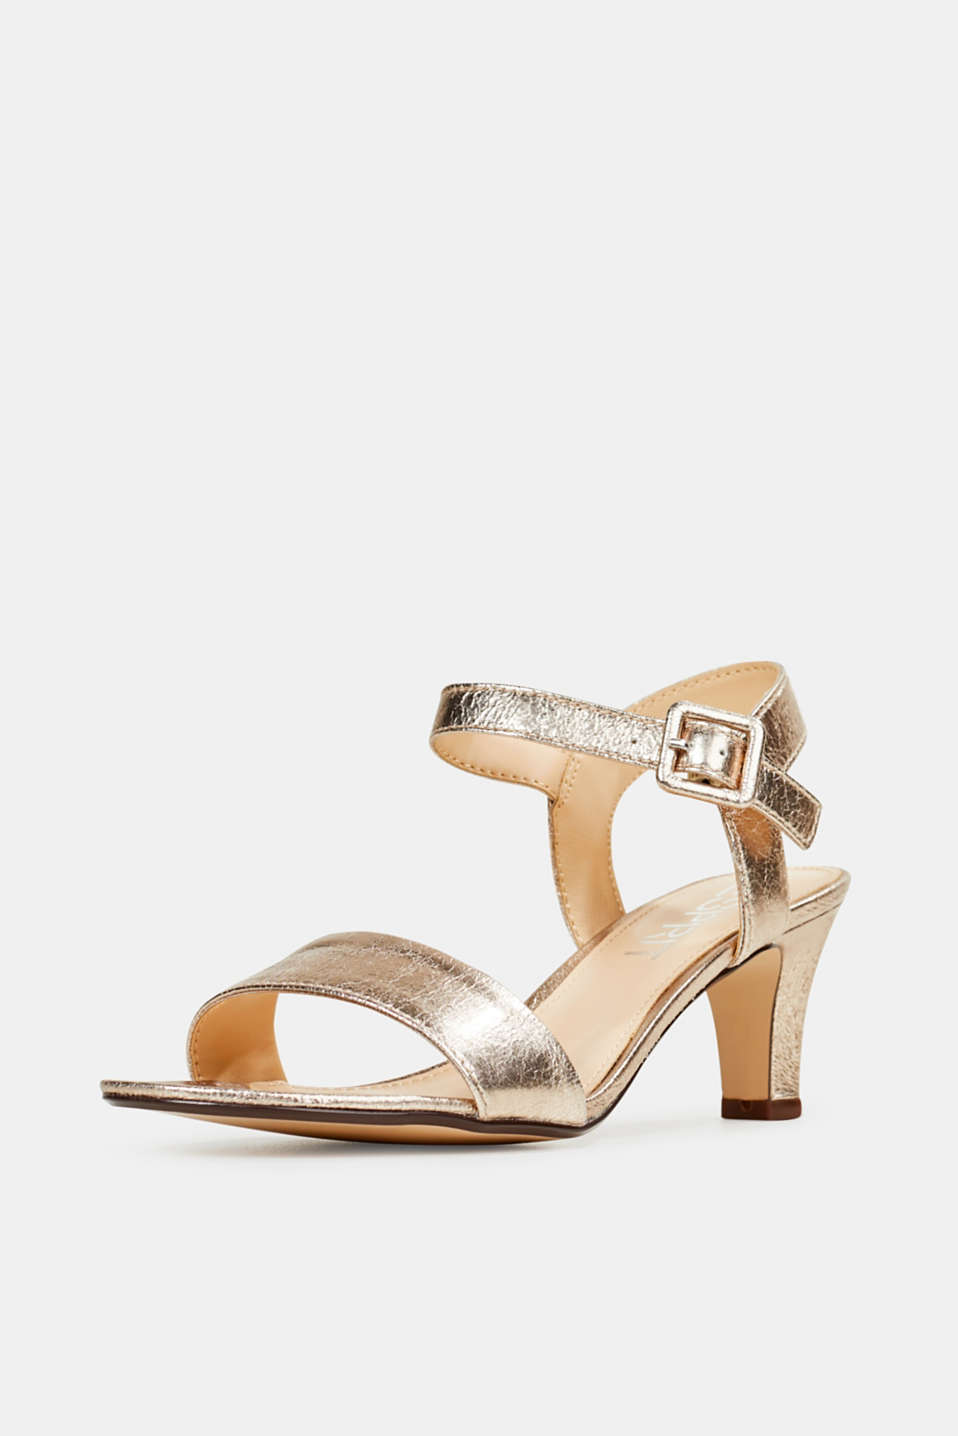 Sandals in a crushed metallic look, SKIN BEIGE, detail image number 2